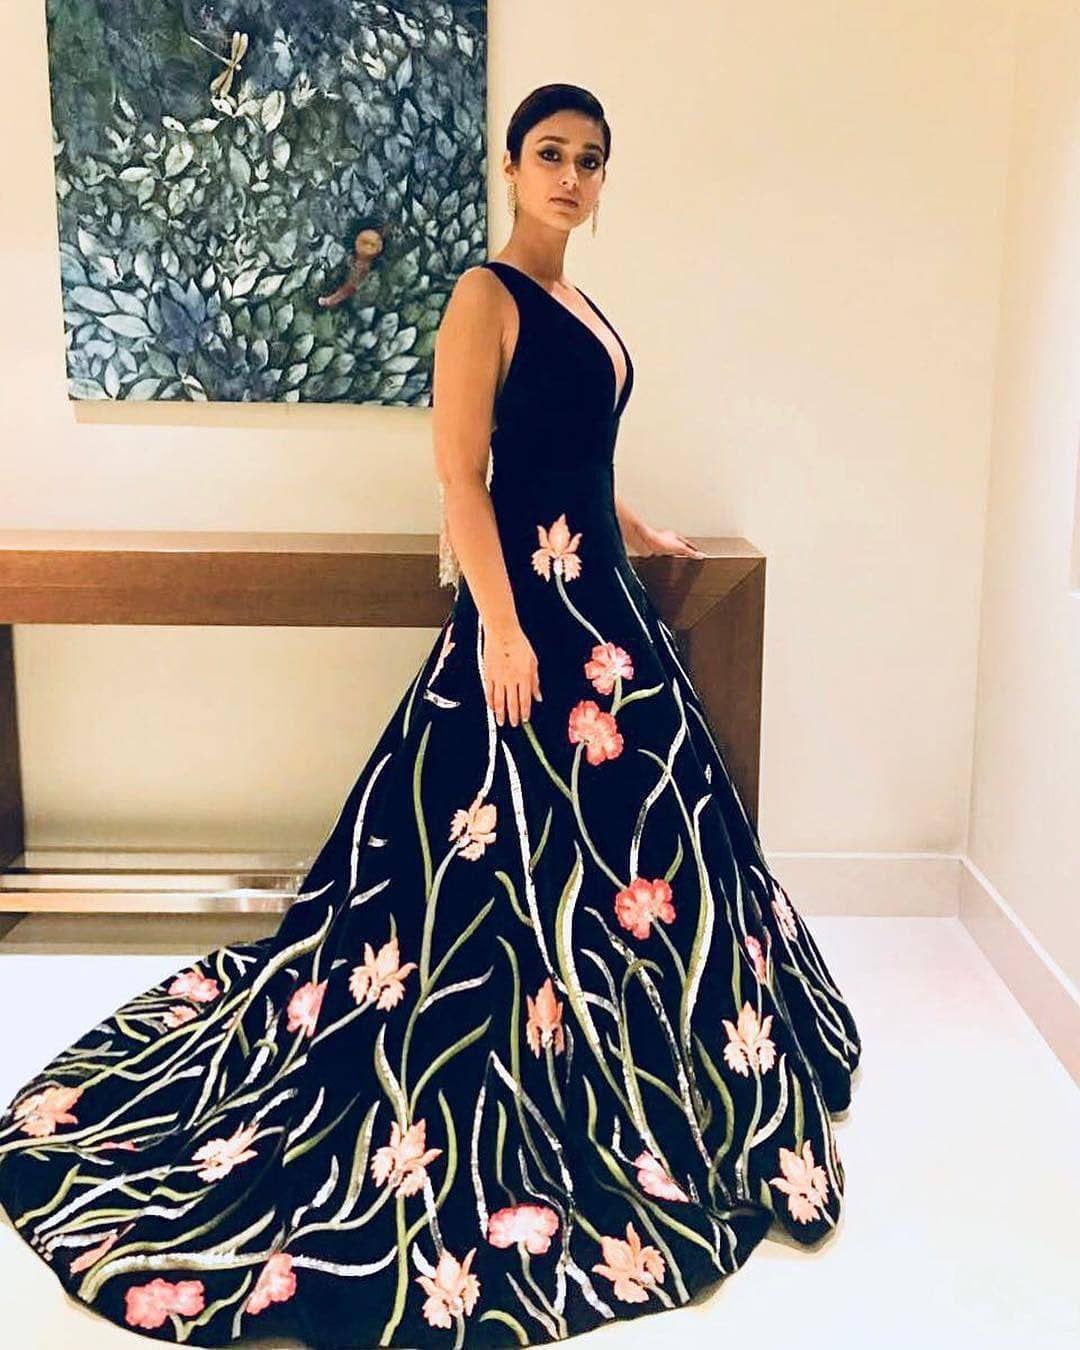 Manish Malhotra At Its Best Ileana Official Looking Stuuning In Manish Malhotra Designer Dress Ileanadcruz With Images Gowns Of Elegance Dresses Elegant Dresses